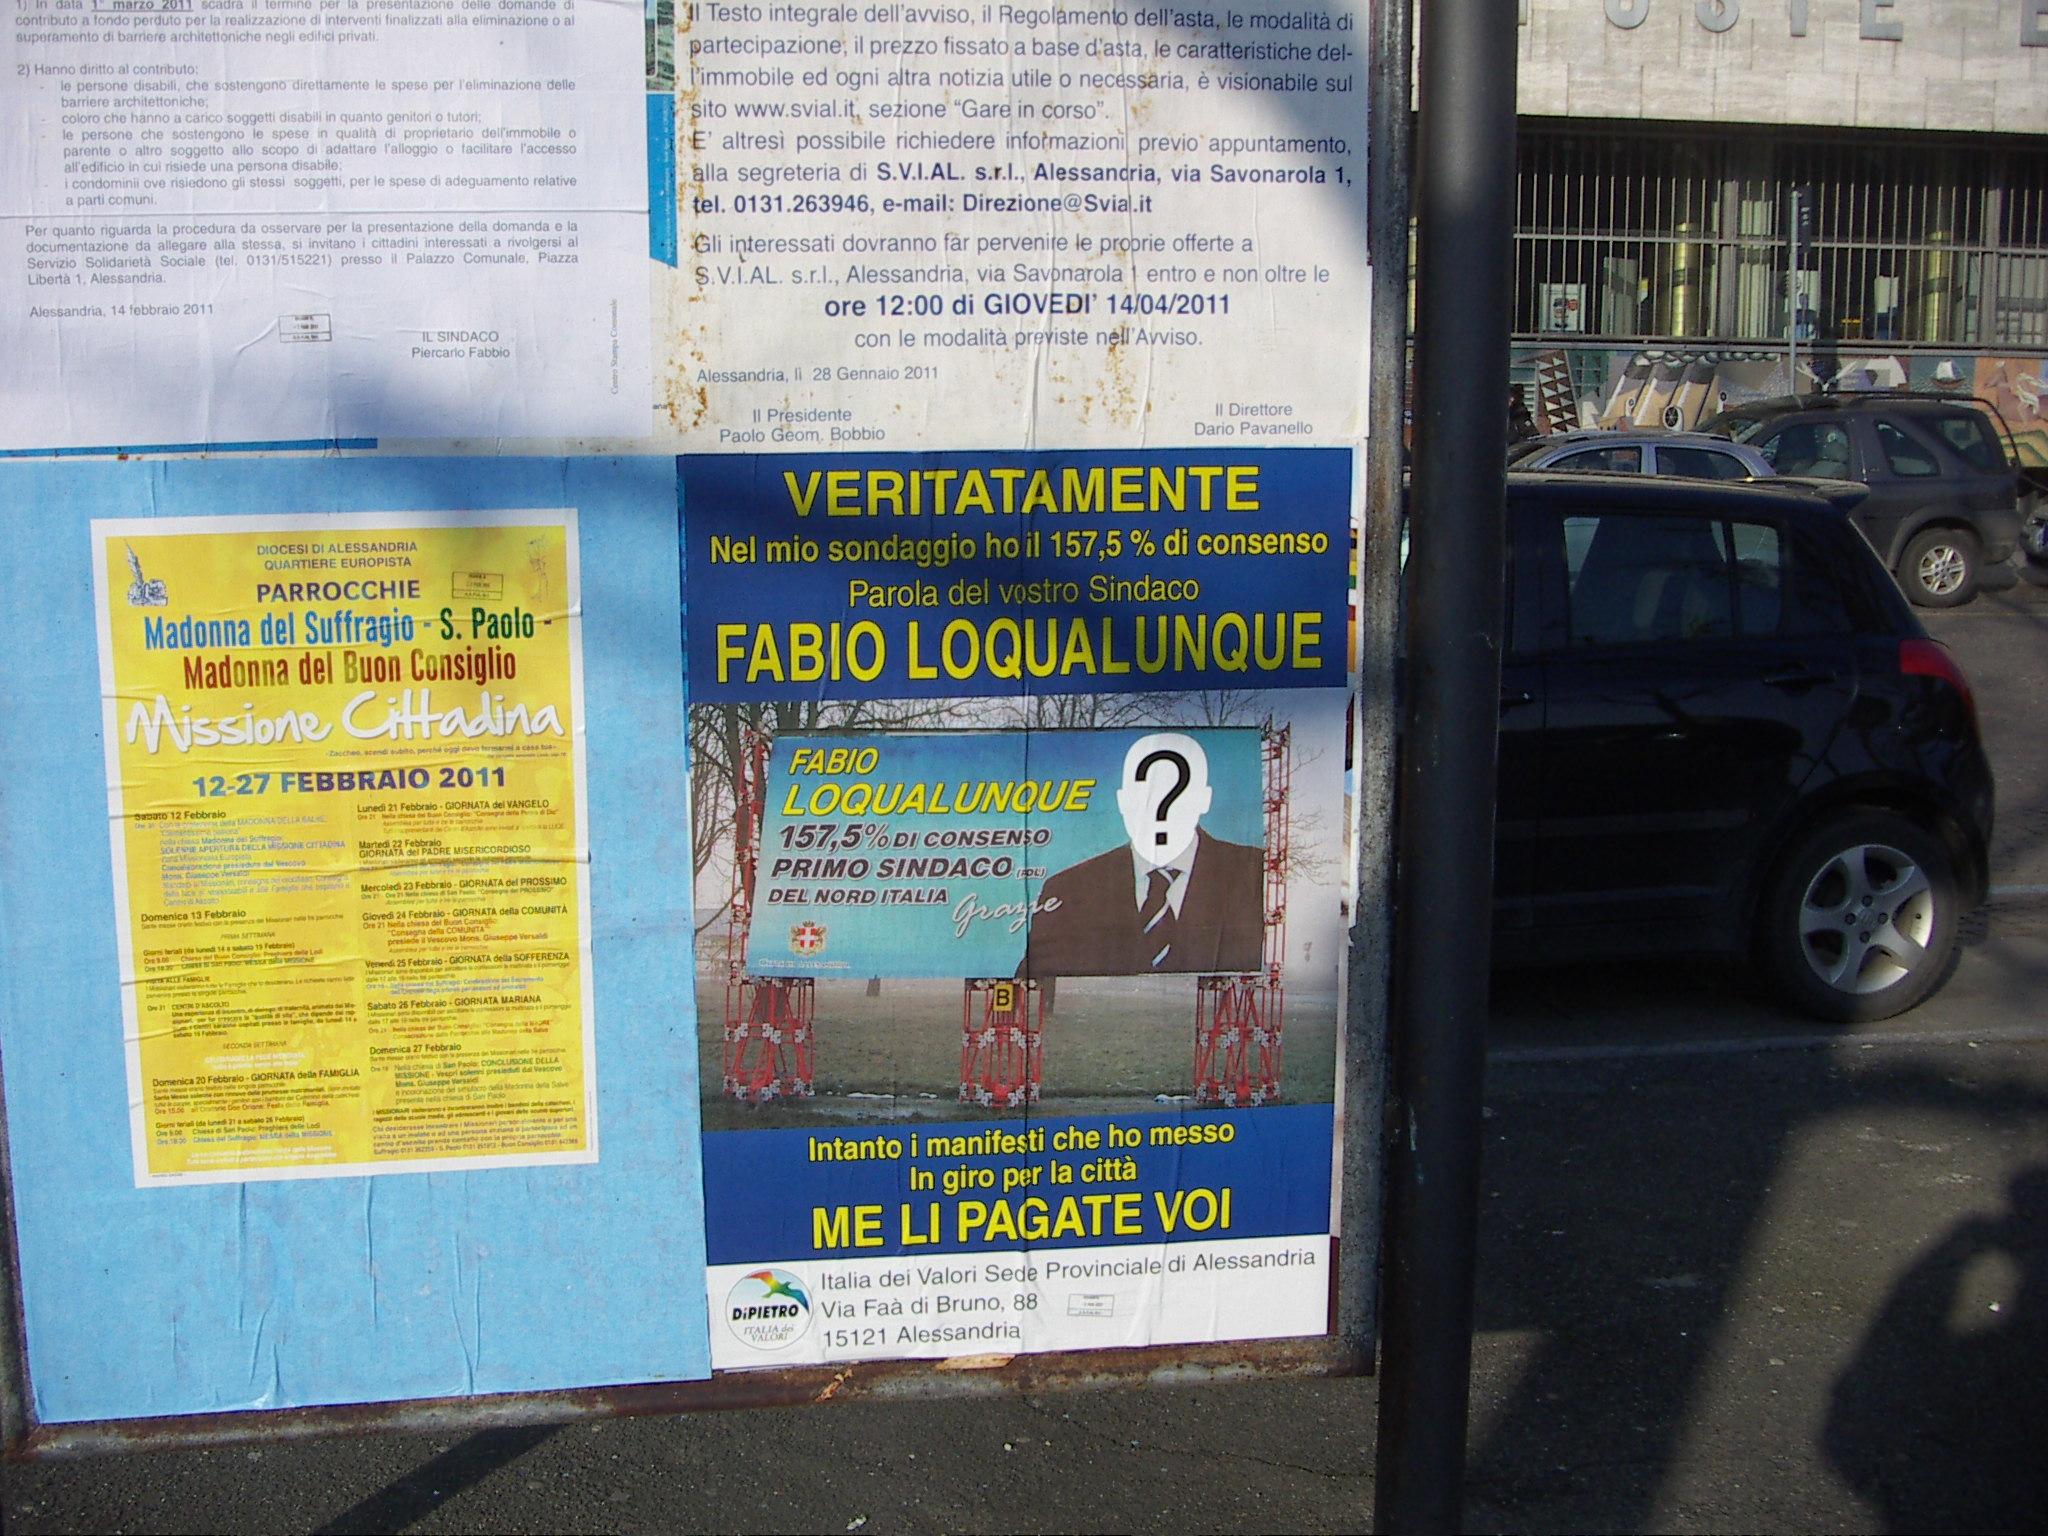 manifesto, piercarlo fabbio, italia dei valori